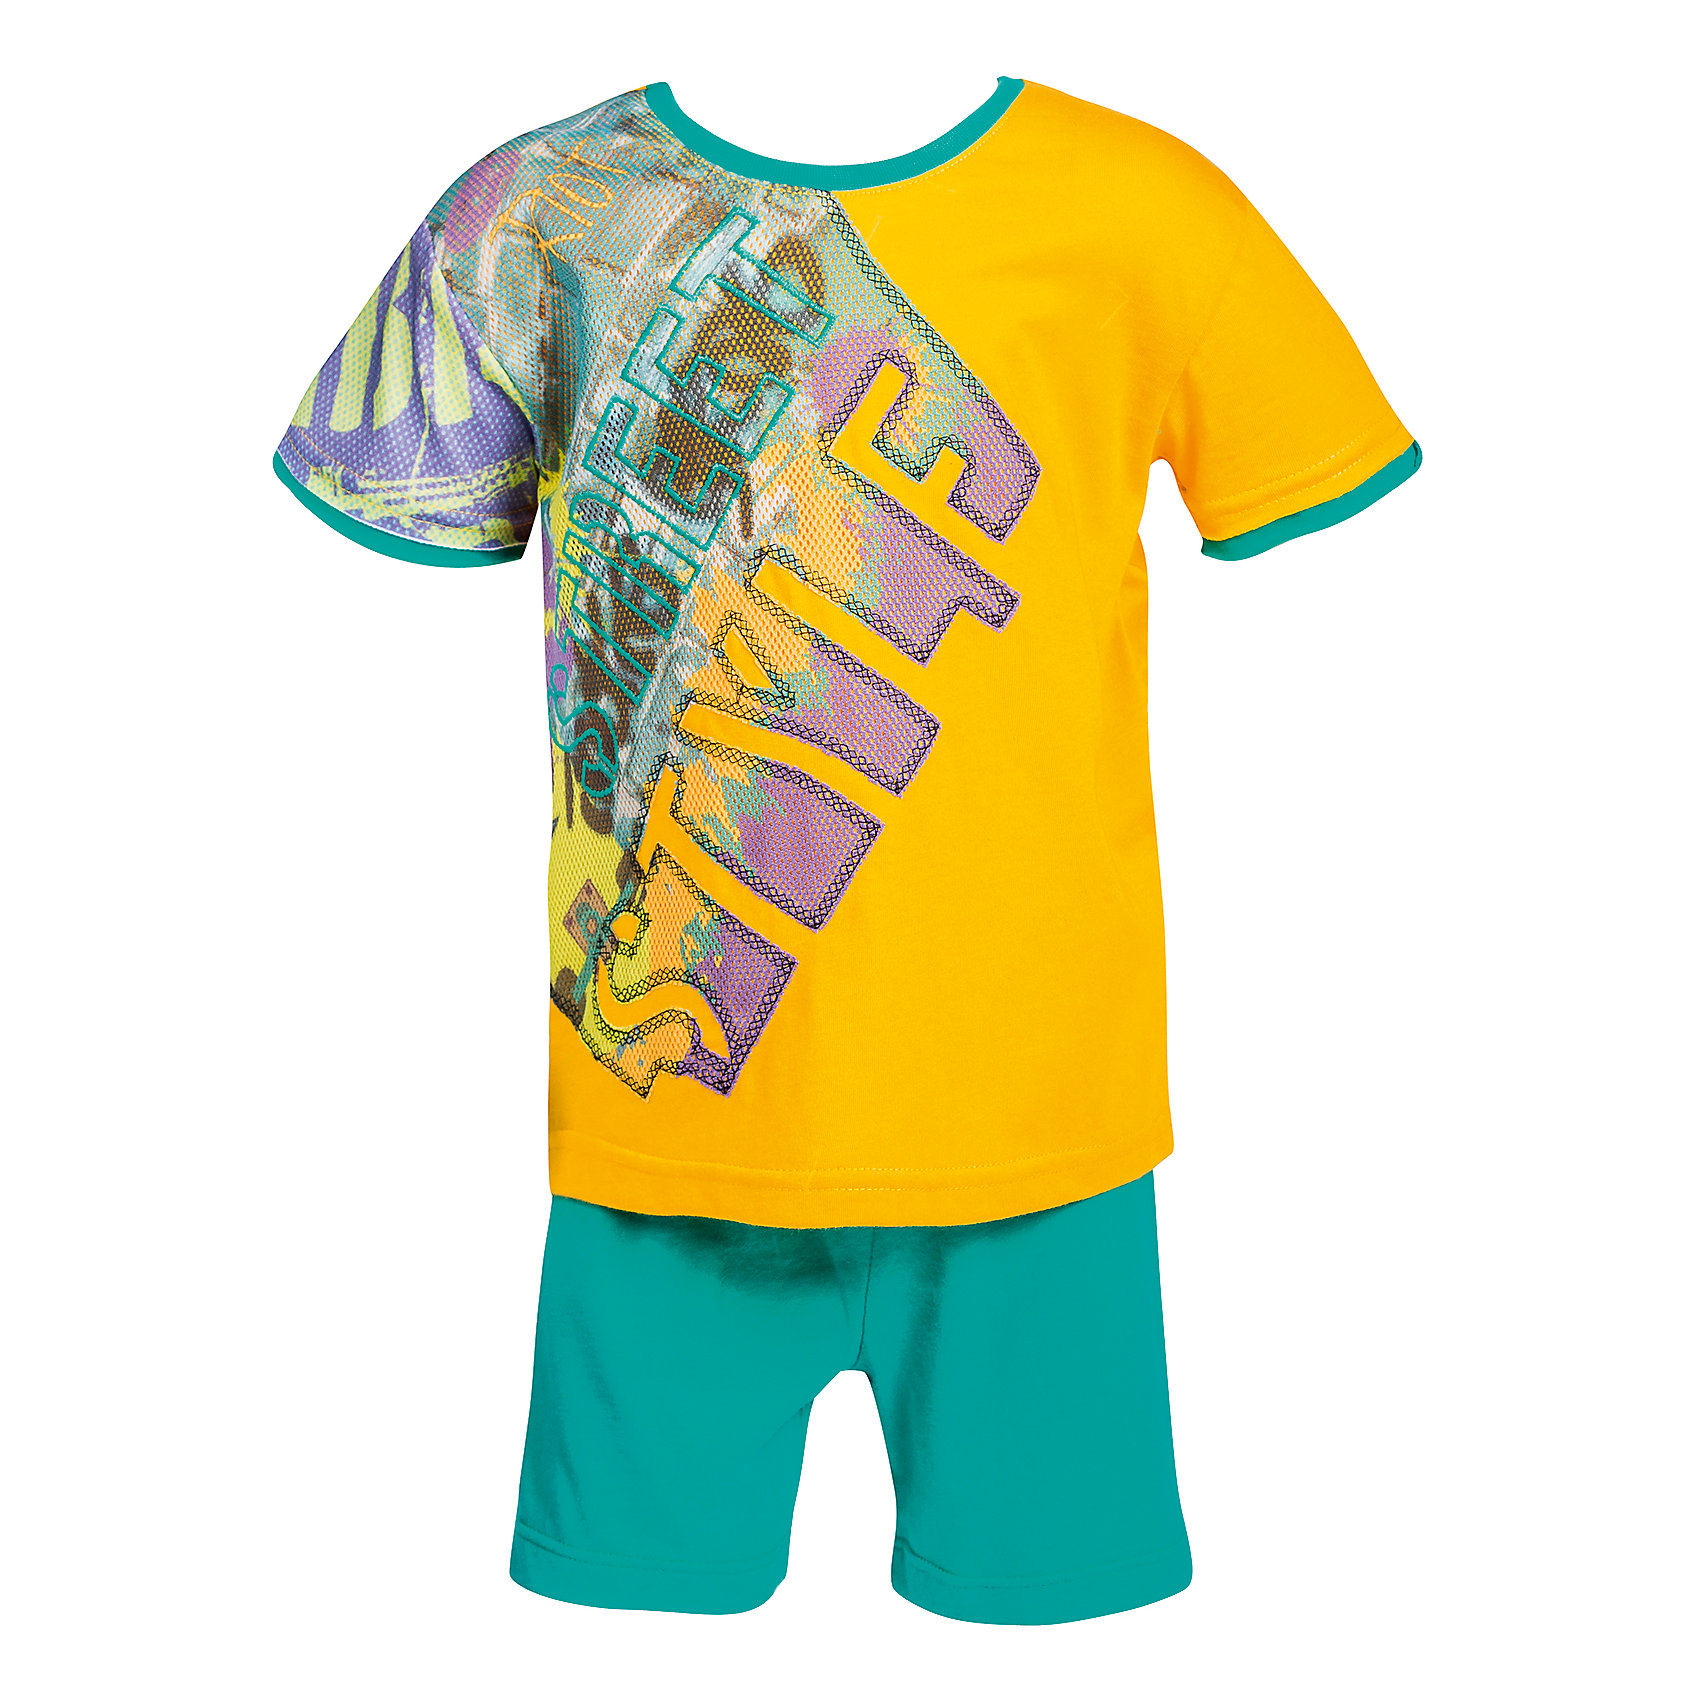 Bell Bimbo Комплект: Футболка и шорты для мальчика Bell Bimbo bell bimbo комплект футболка и юбка для девочки bell bimbo